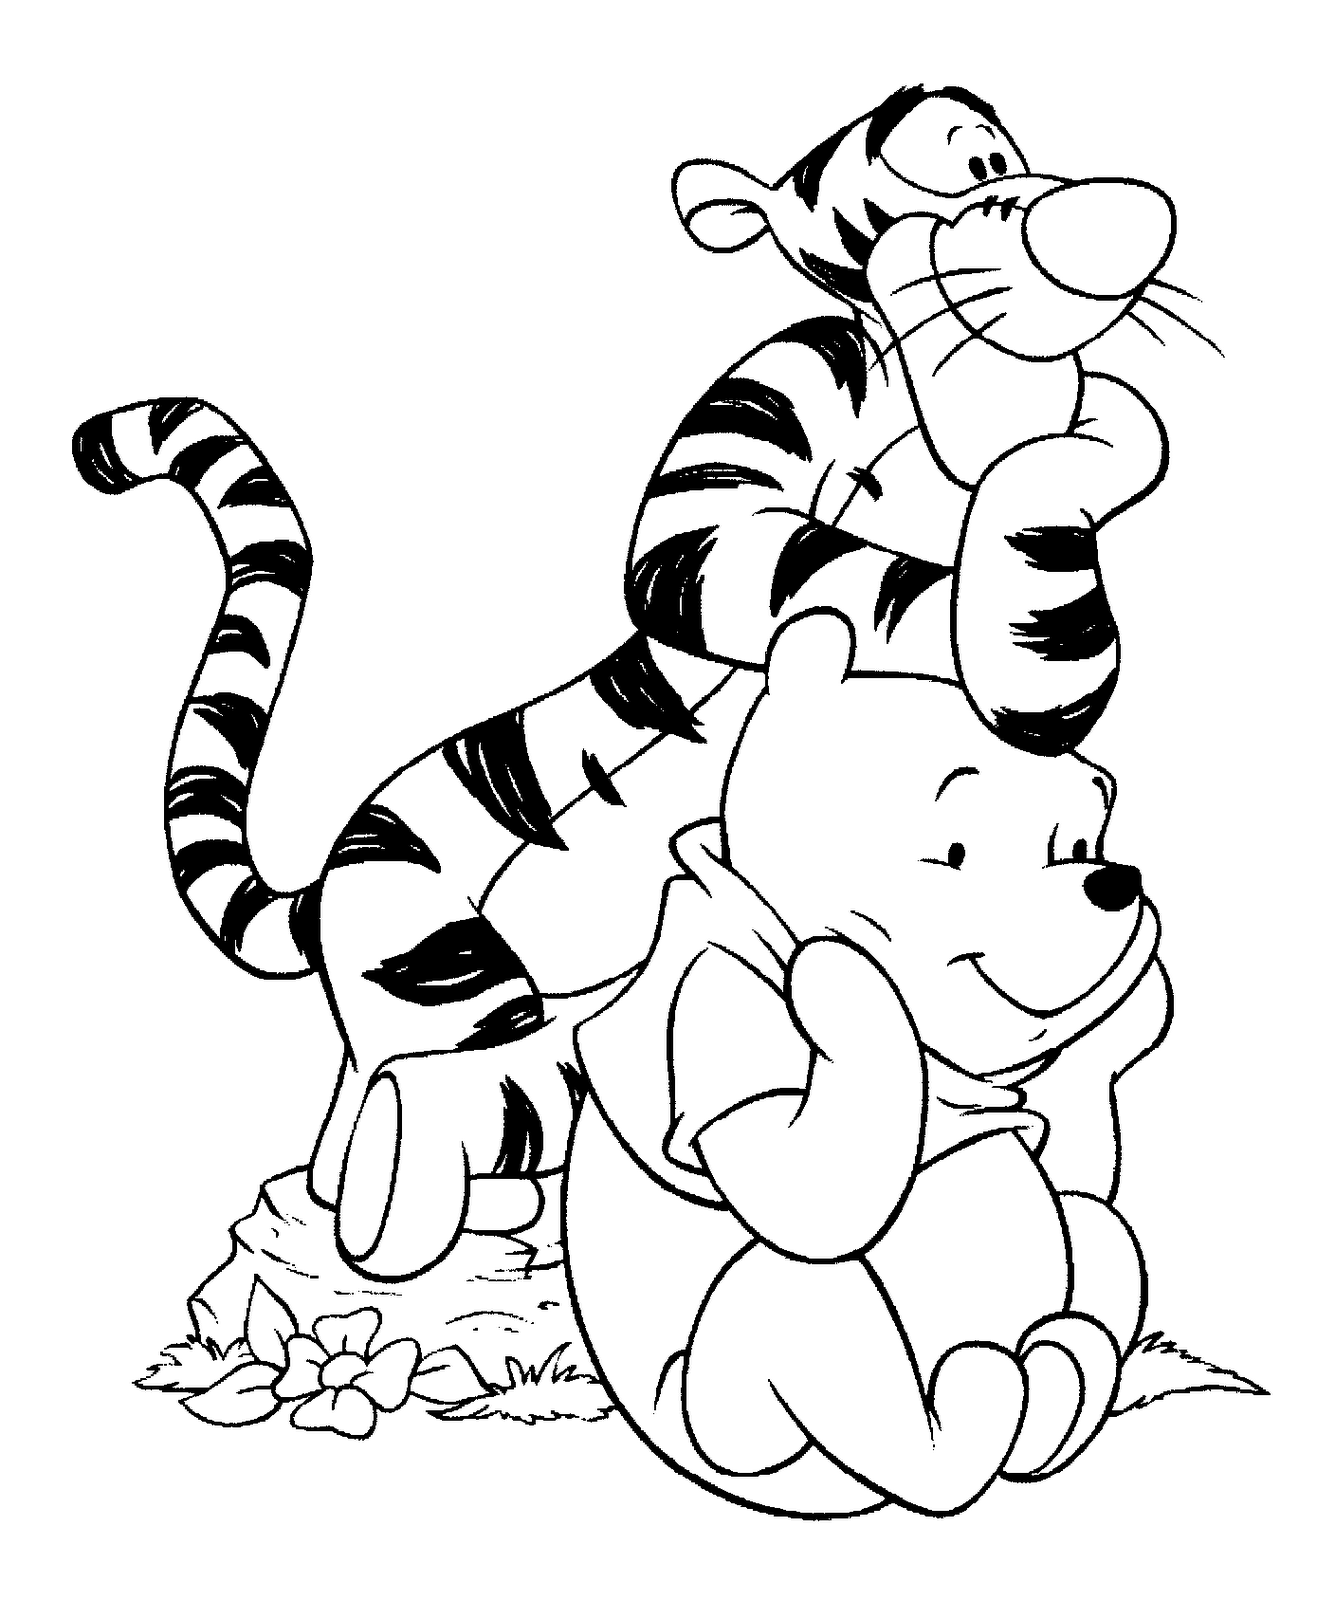 Imagenes De Muñequitos Para Dibujar | Dibujos Para Colorear Online